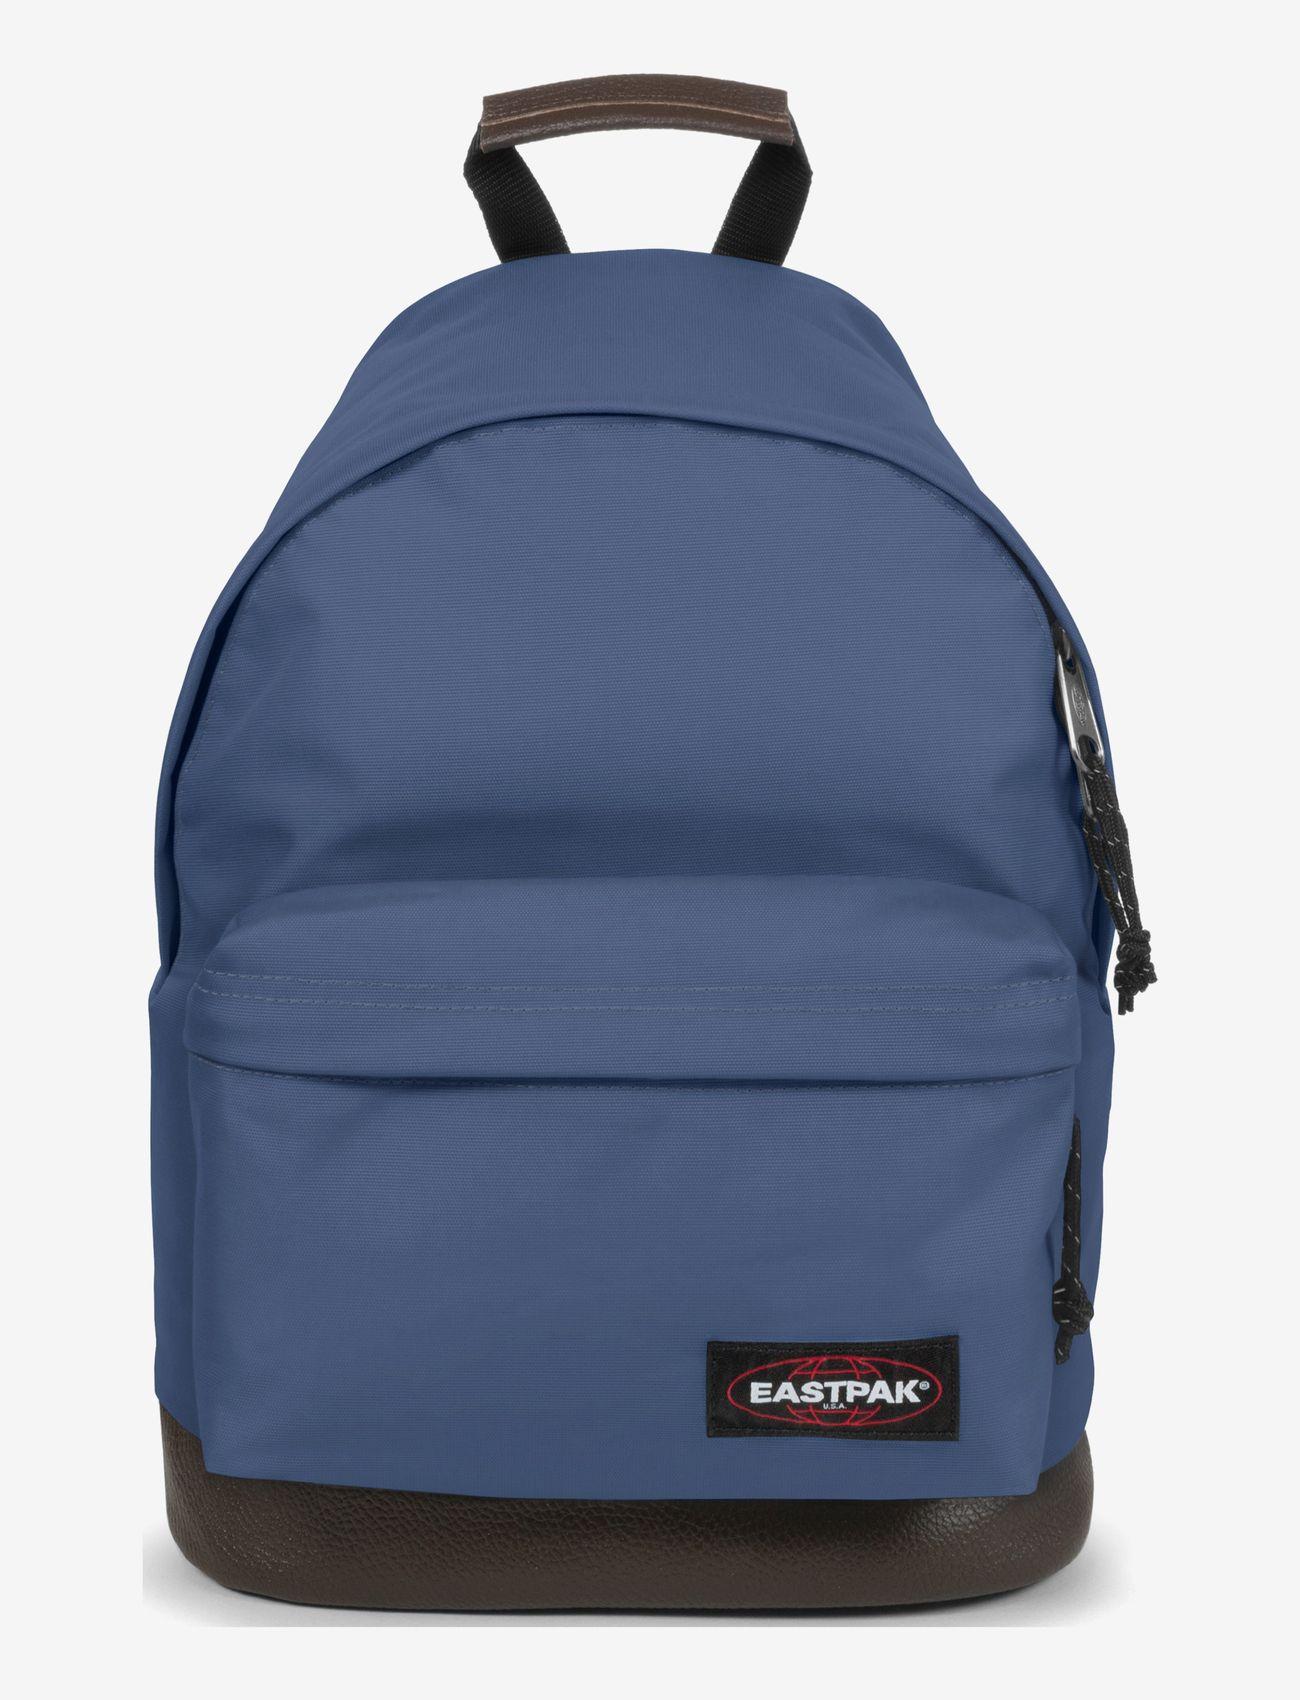 Eastpak - WYOMING - ryggsäckar - humble blue - 0